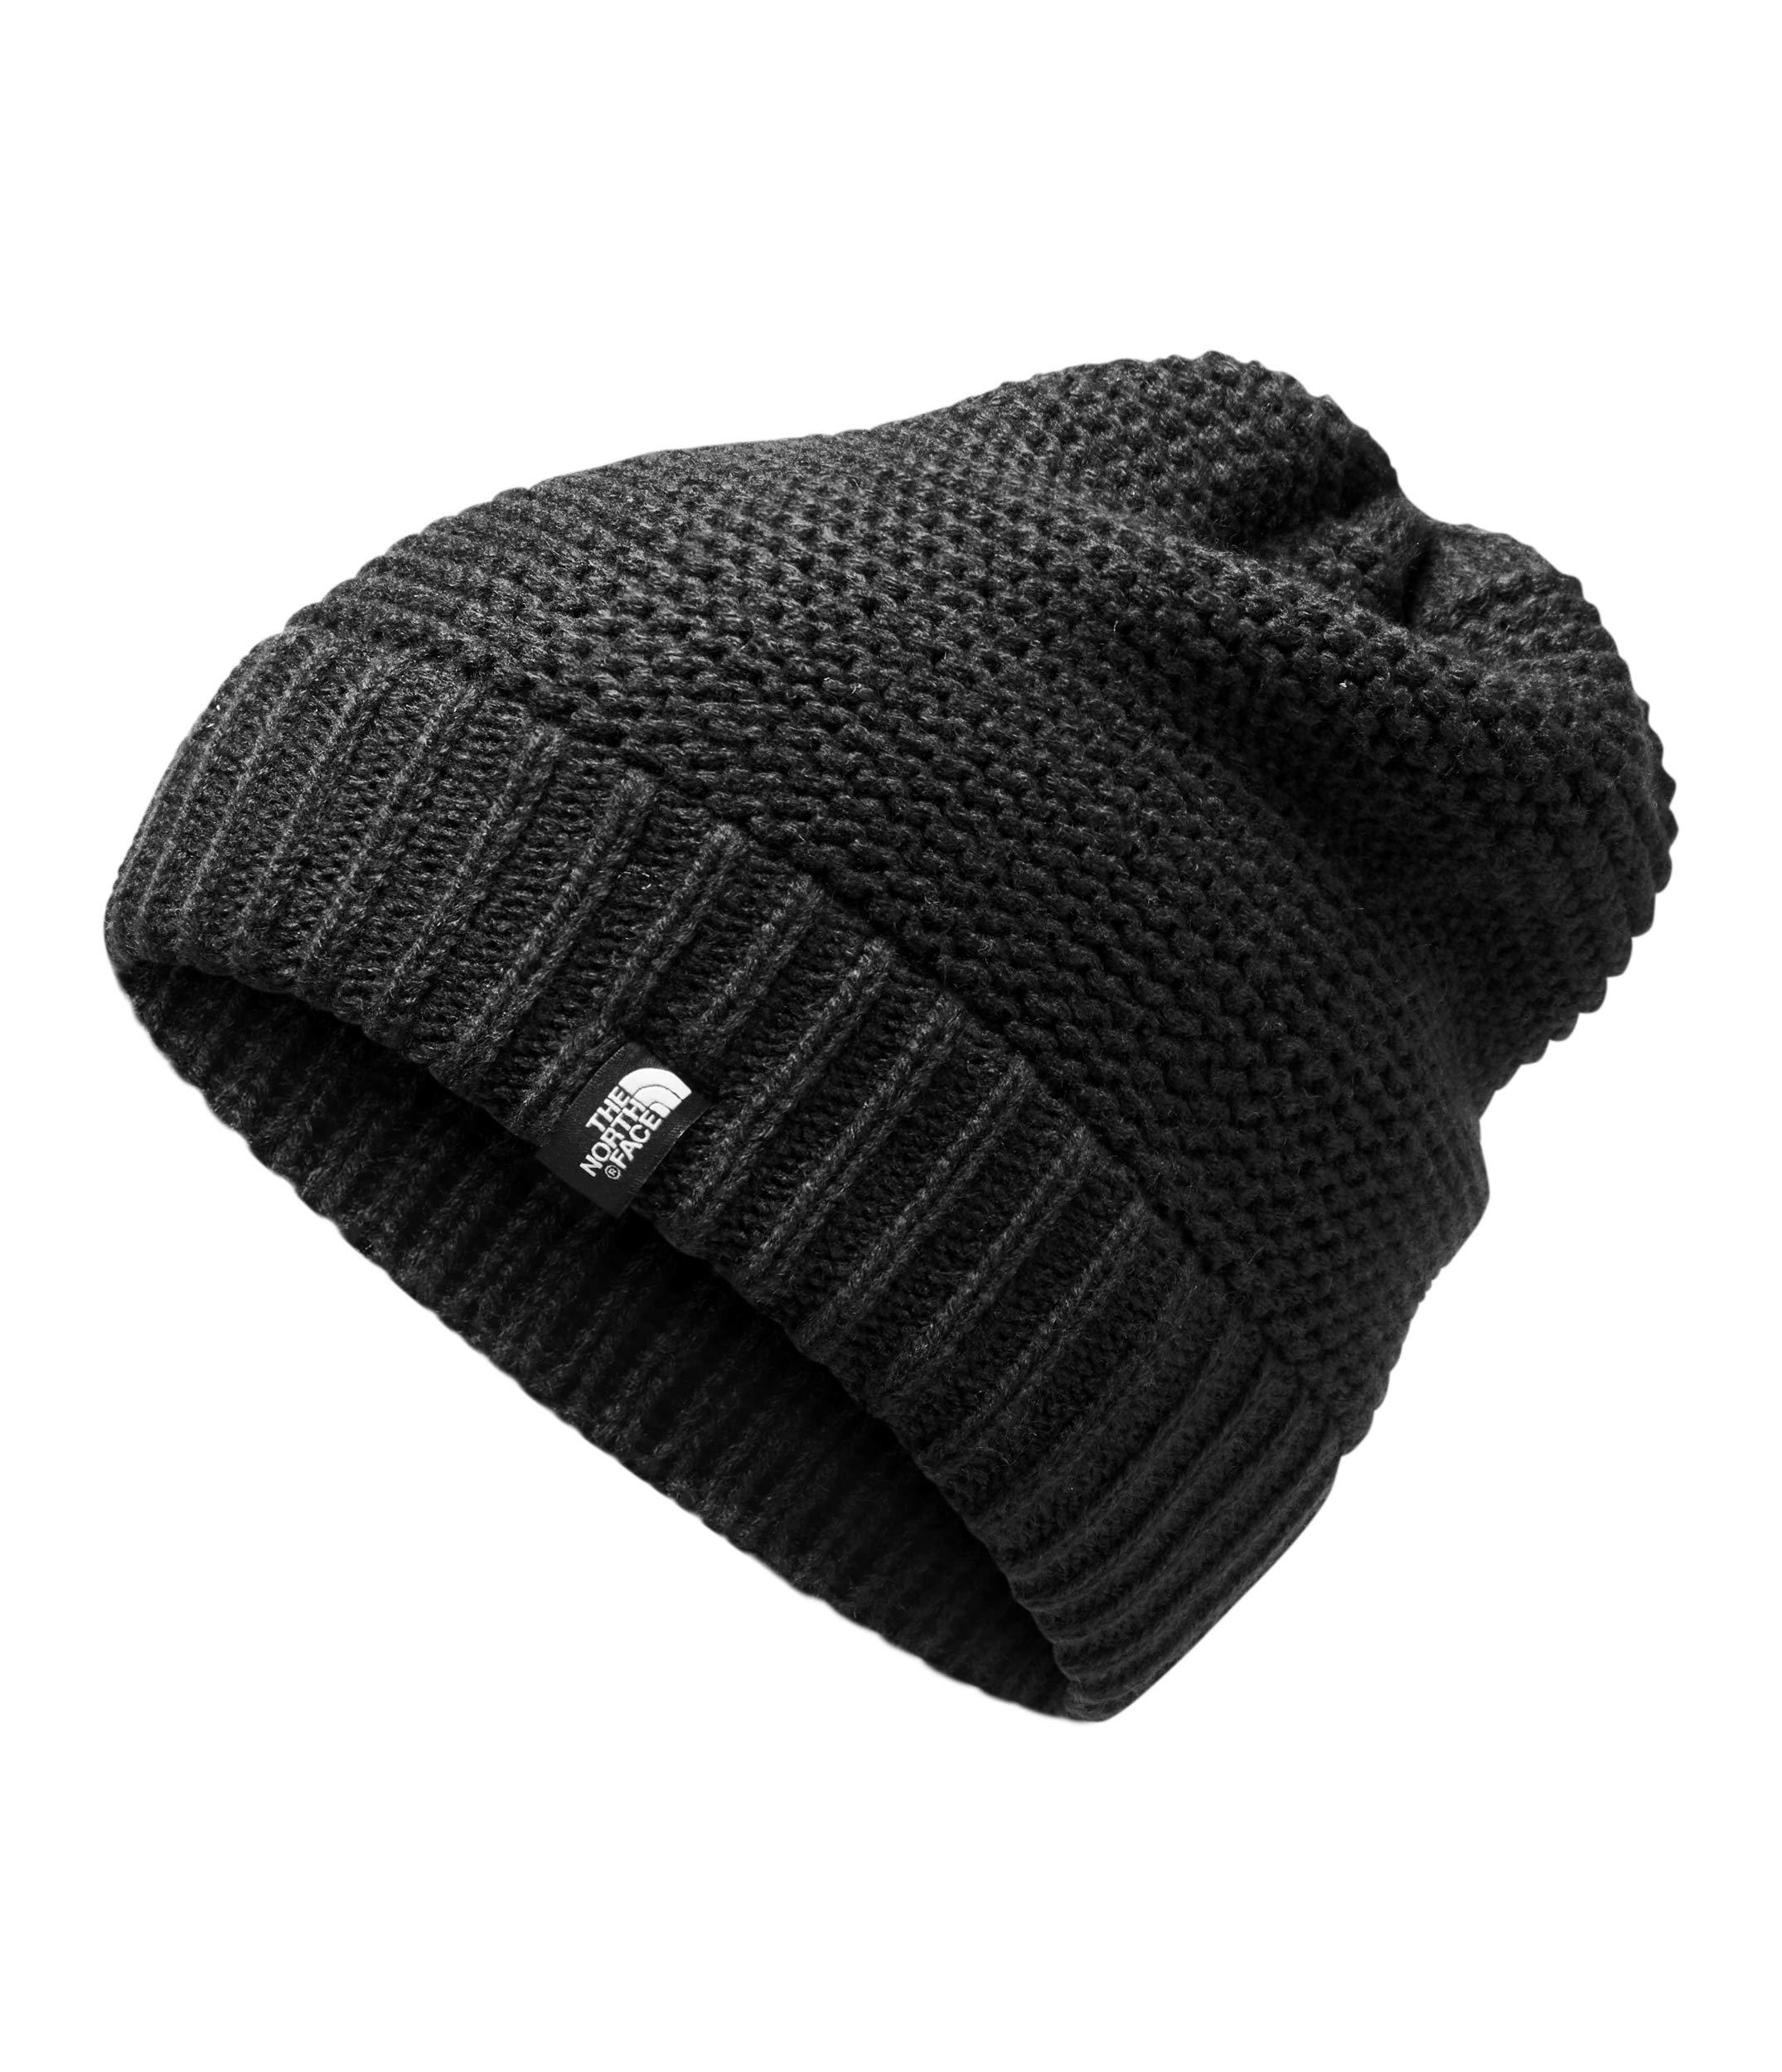 The North Face Women's Purrl Stitch Beanie, TNF Black, One Size